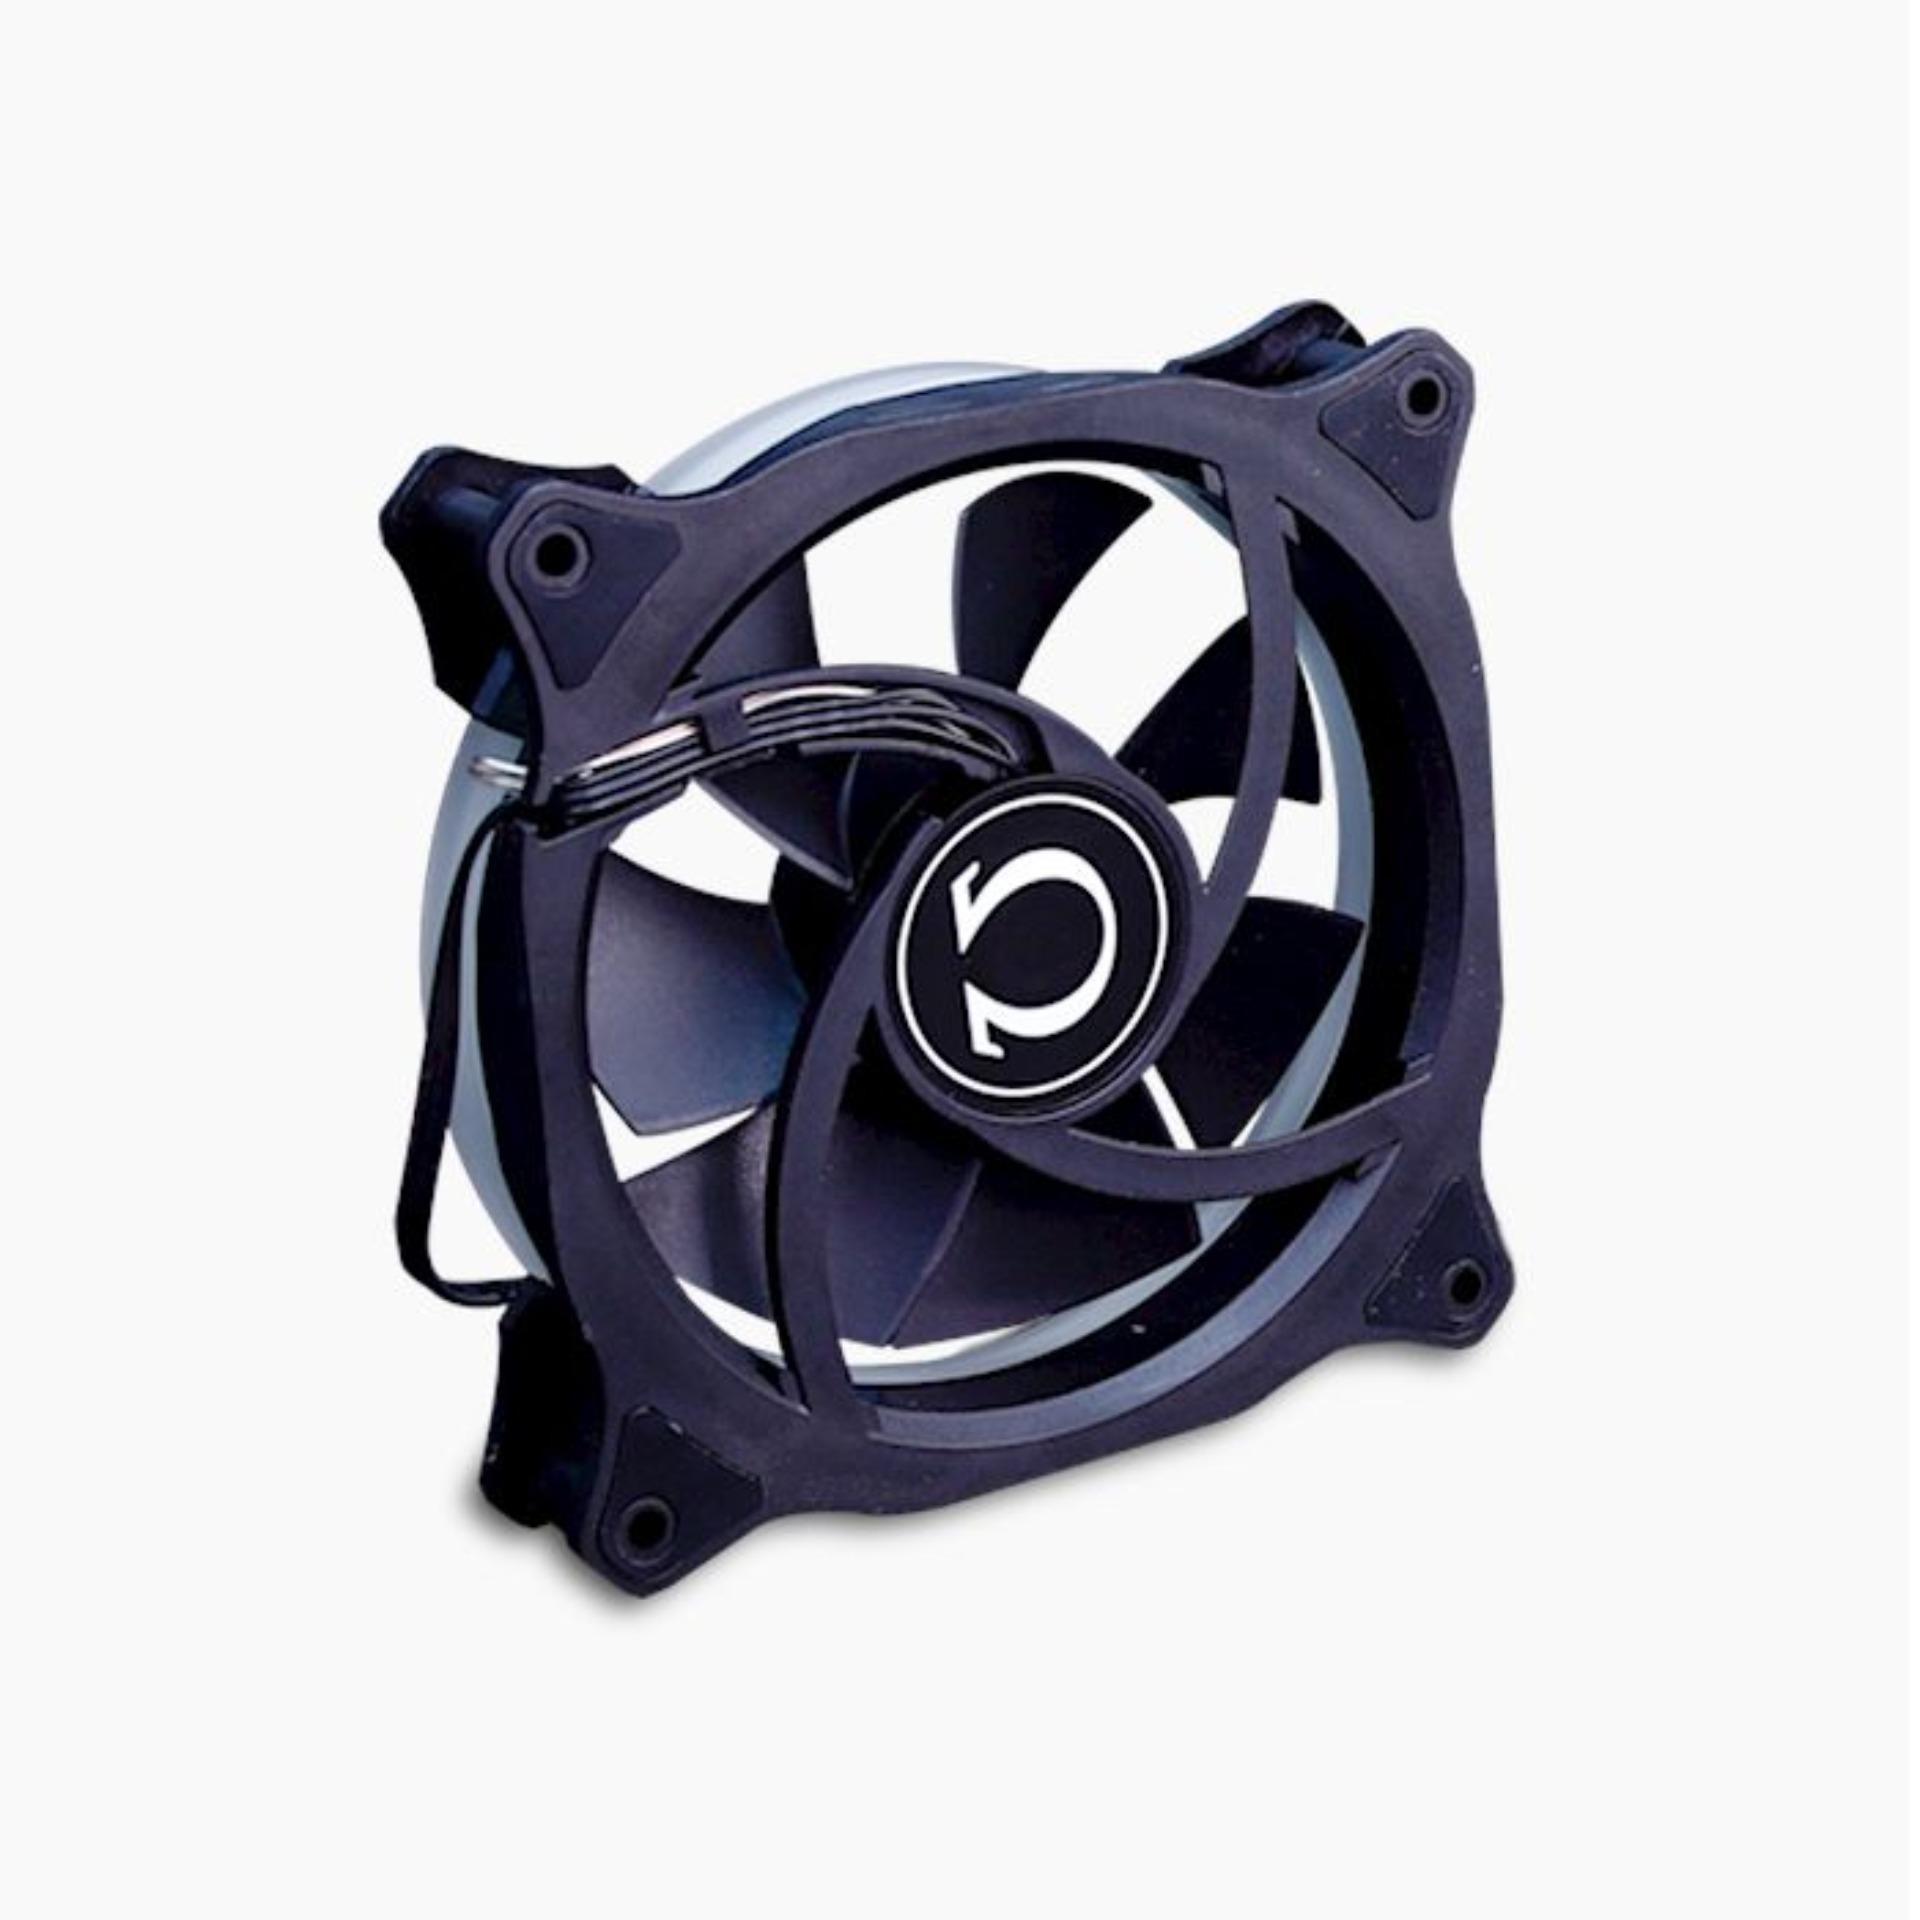 Pc Cabinet Fans For Sale Computer Prices Brands Deepcool Xfan 12cm Casing Fan Red Led Omega Nova 120mm Single Color White